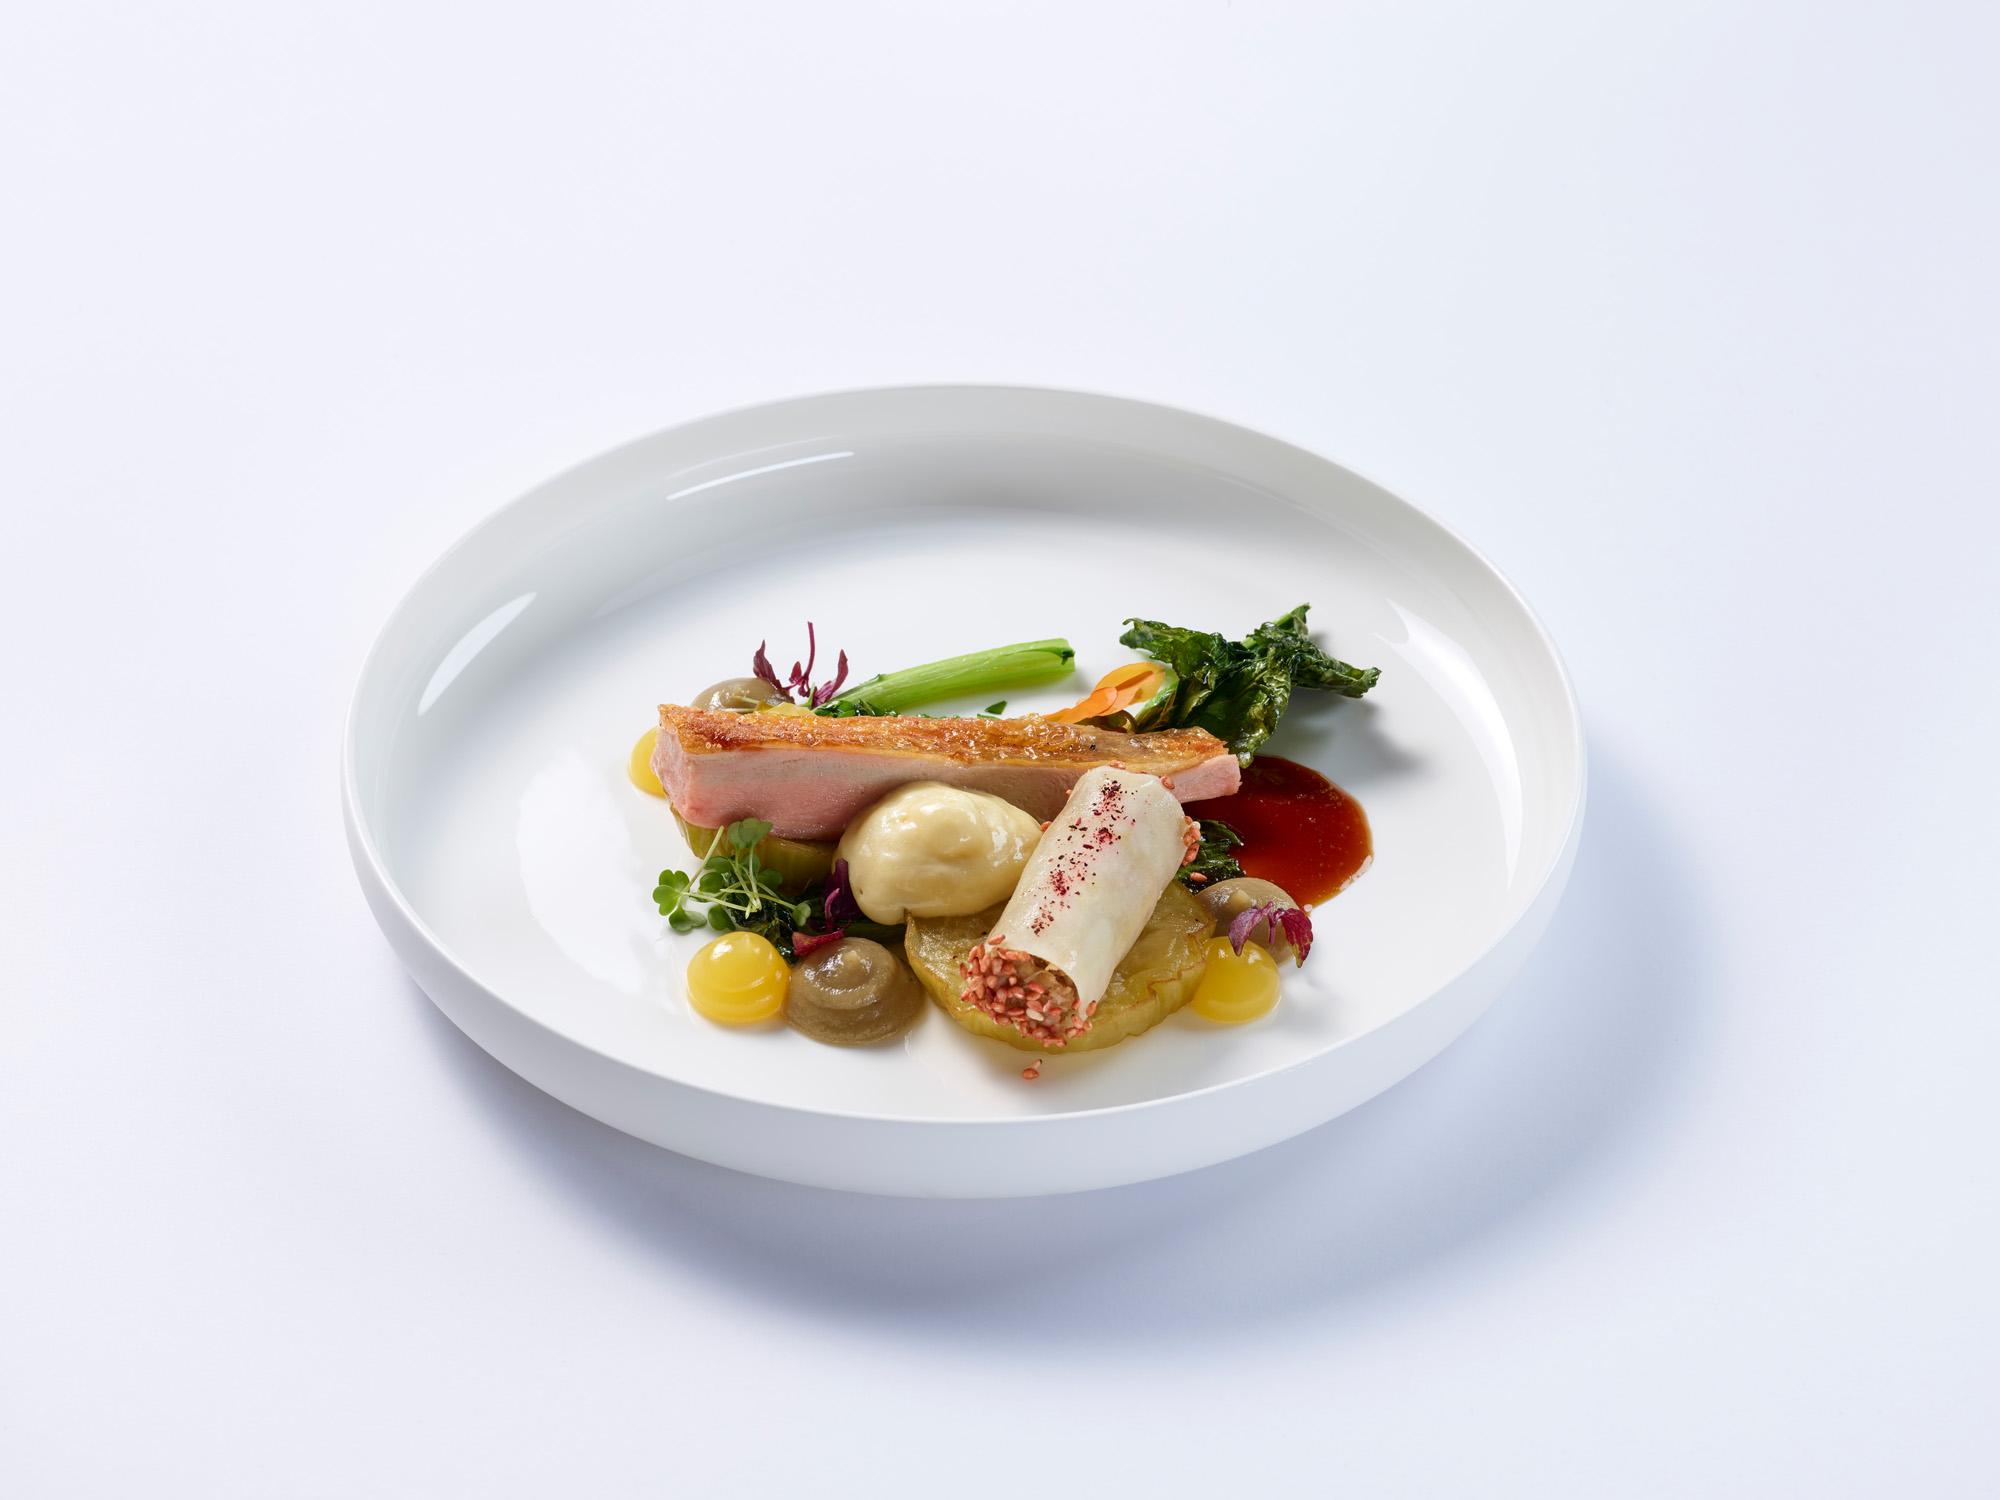 iSi Speisemeisterei 21 9 176172 - iSi Kulinarik: Inspiring Food